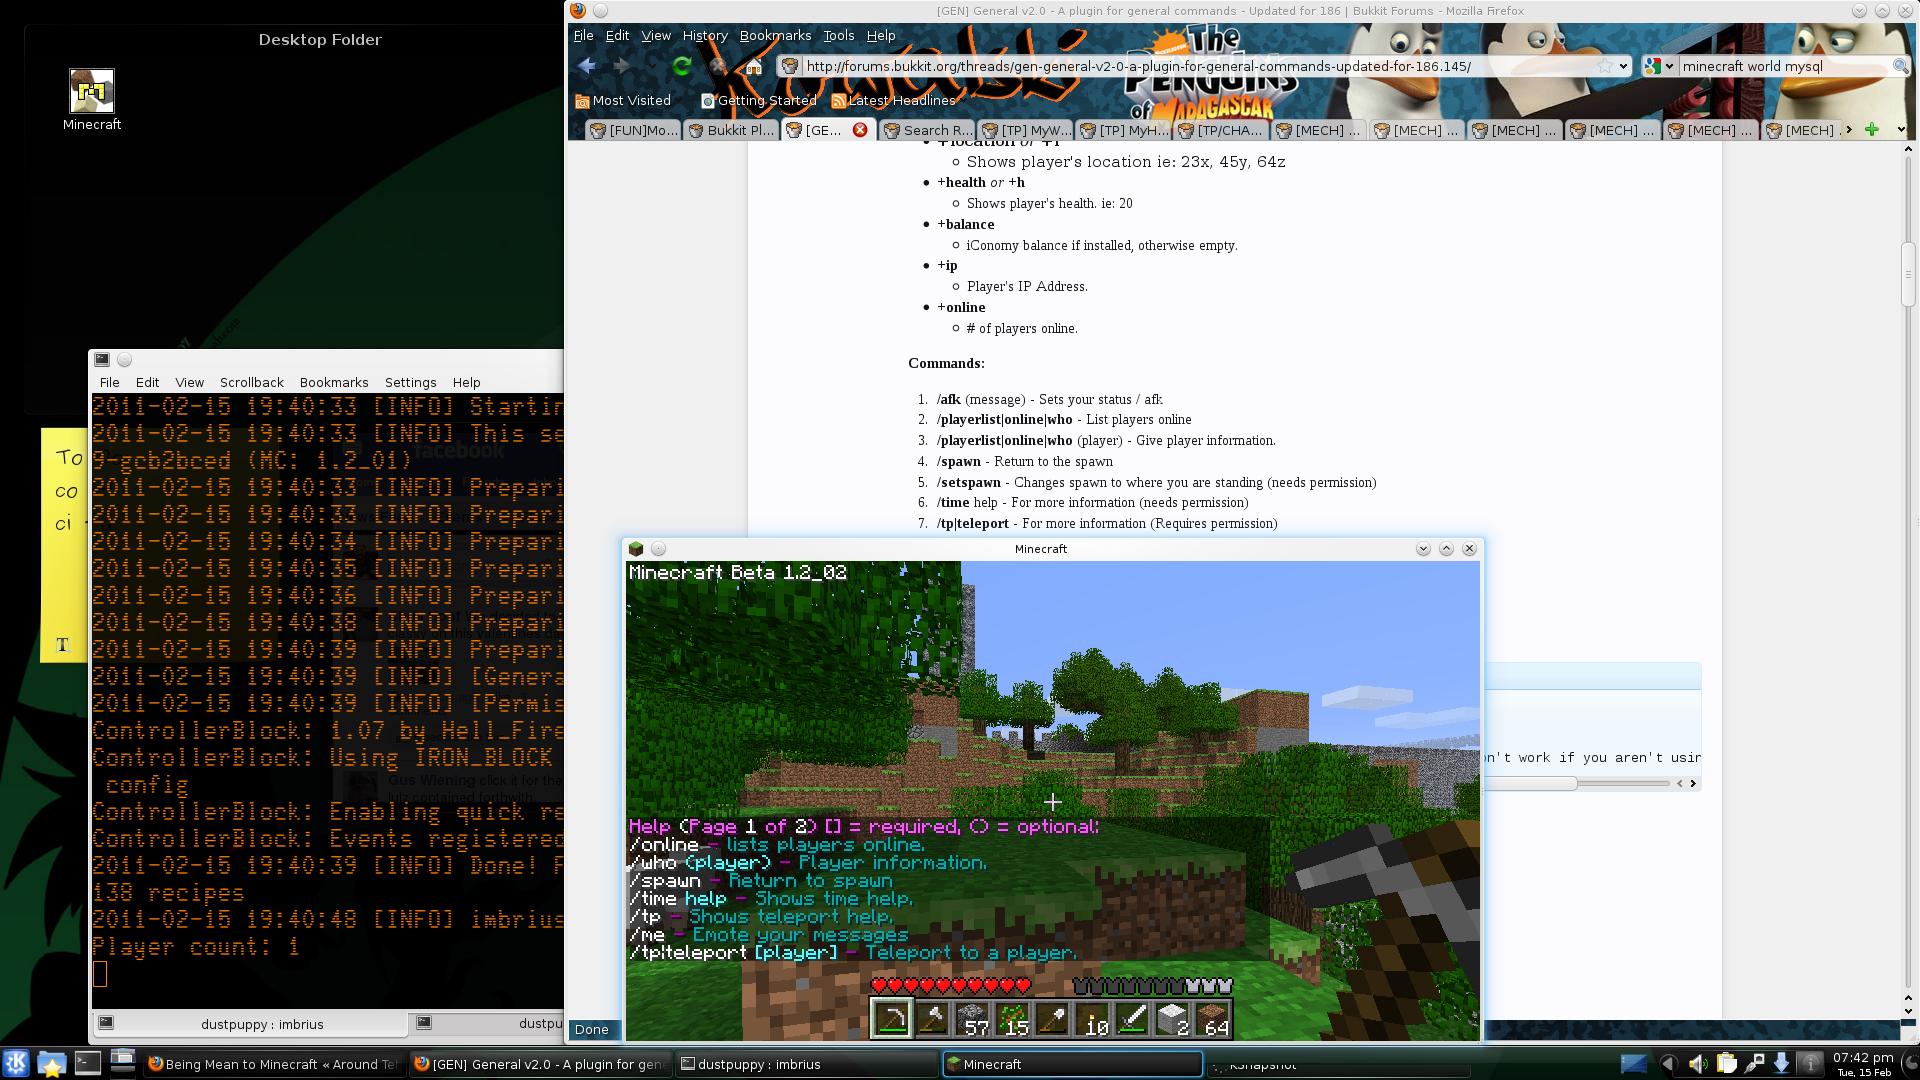 Being Mean to Minecraft | Around Teh Table